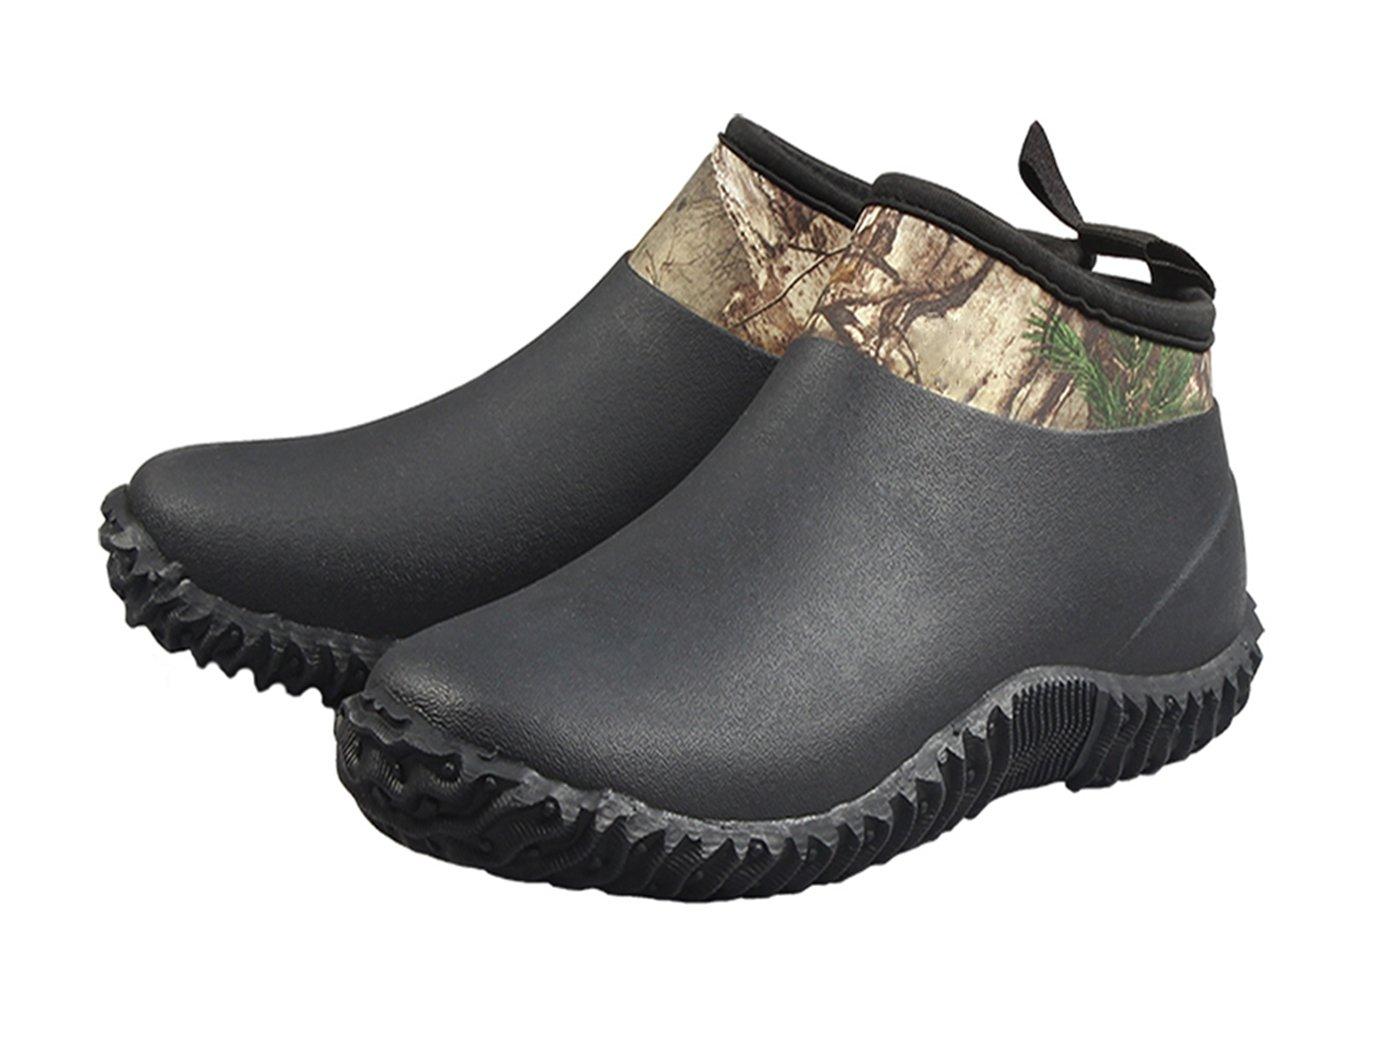 LH Neoprene Unisex Rain Boots and Gardening Shoes B074MTNXV9 7 M US Men/9 M US Women|Black